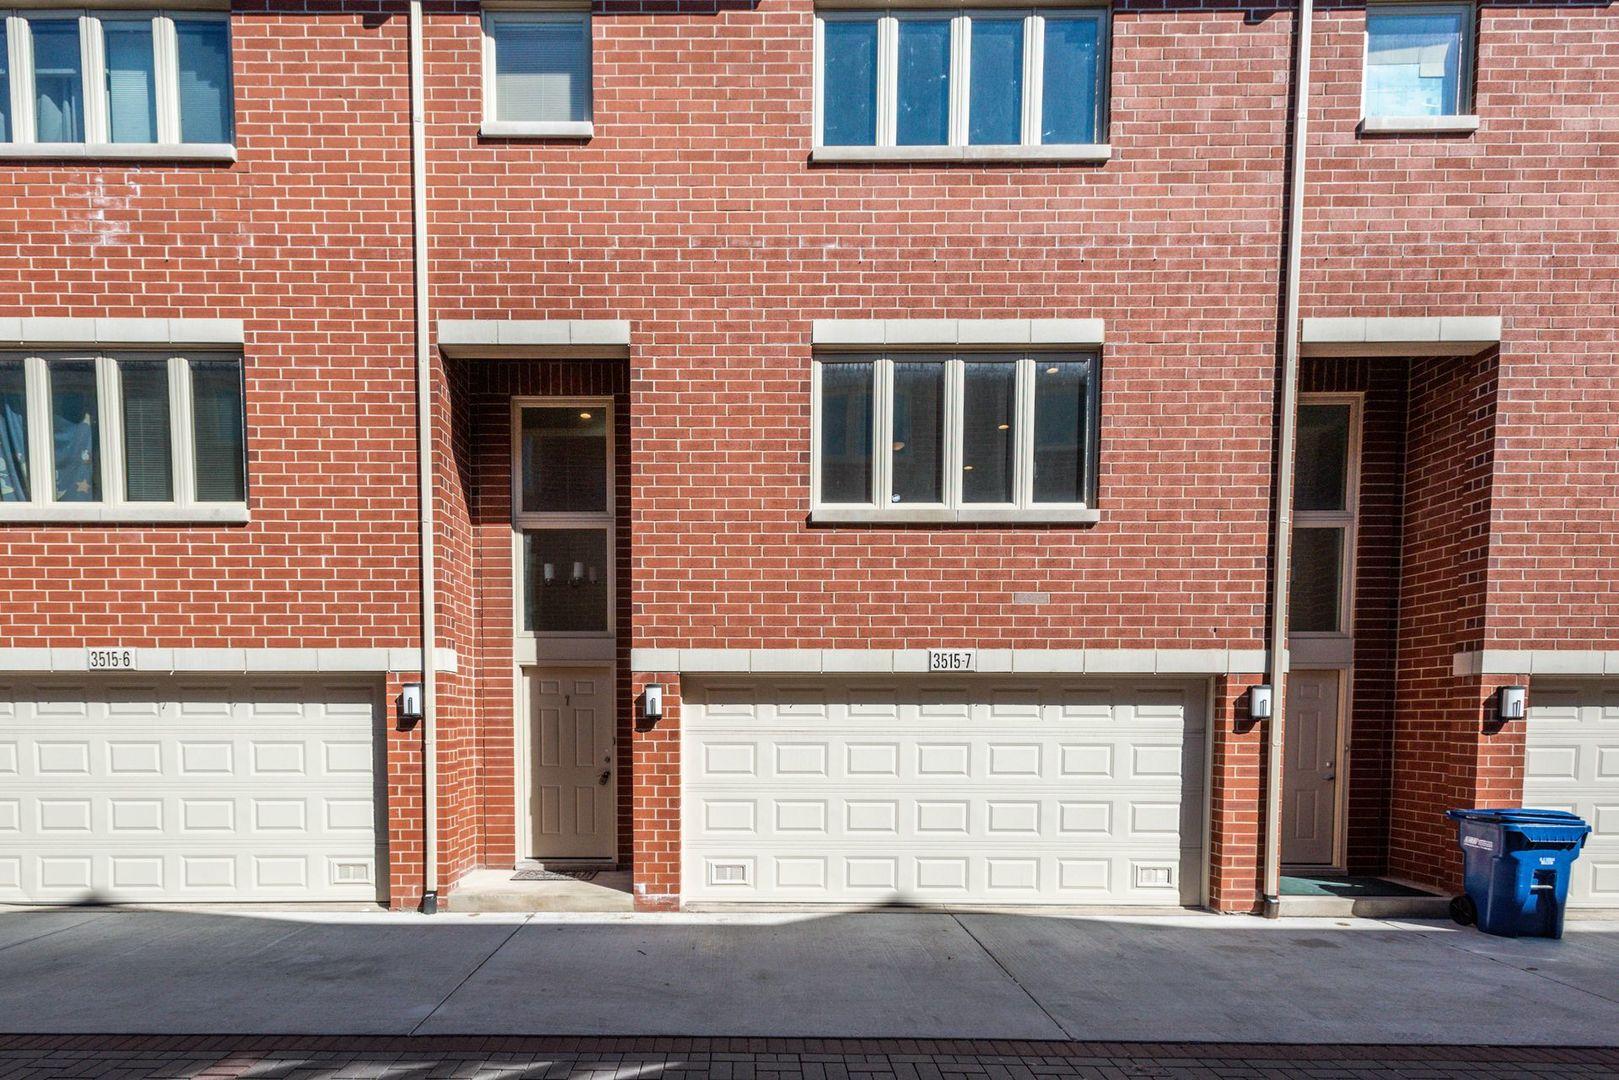 3515 South Maplewood 7, CHICAGO, Illinois, 60632